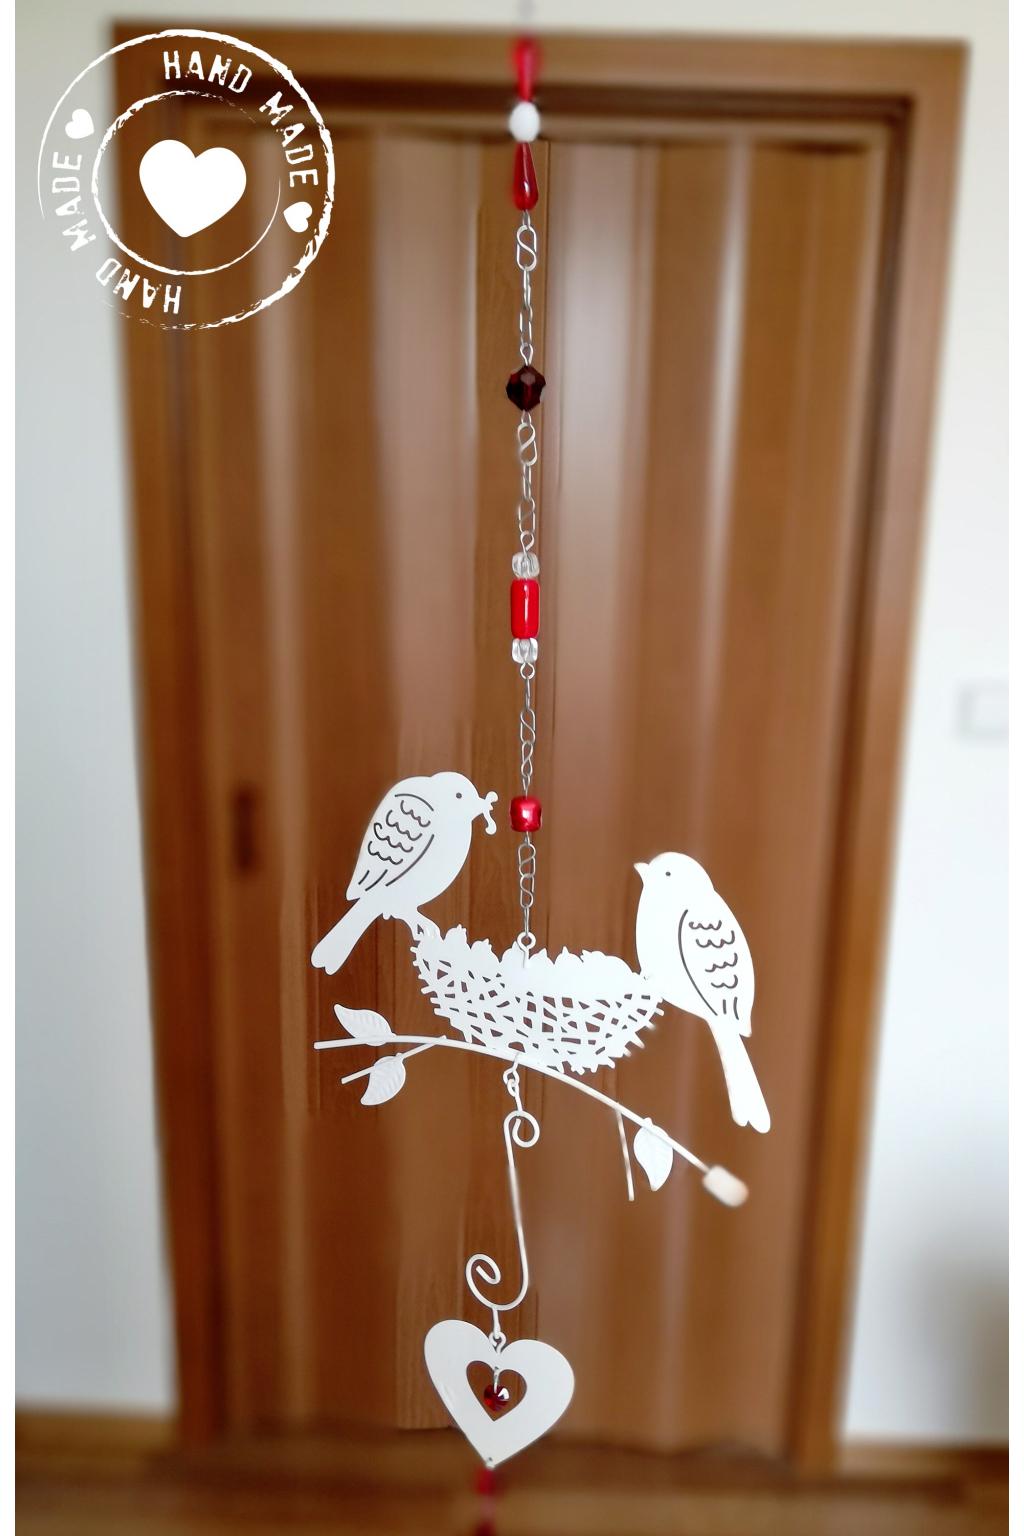 Závěs s ptáčky a srdcem Swarovski - červený 55cm